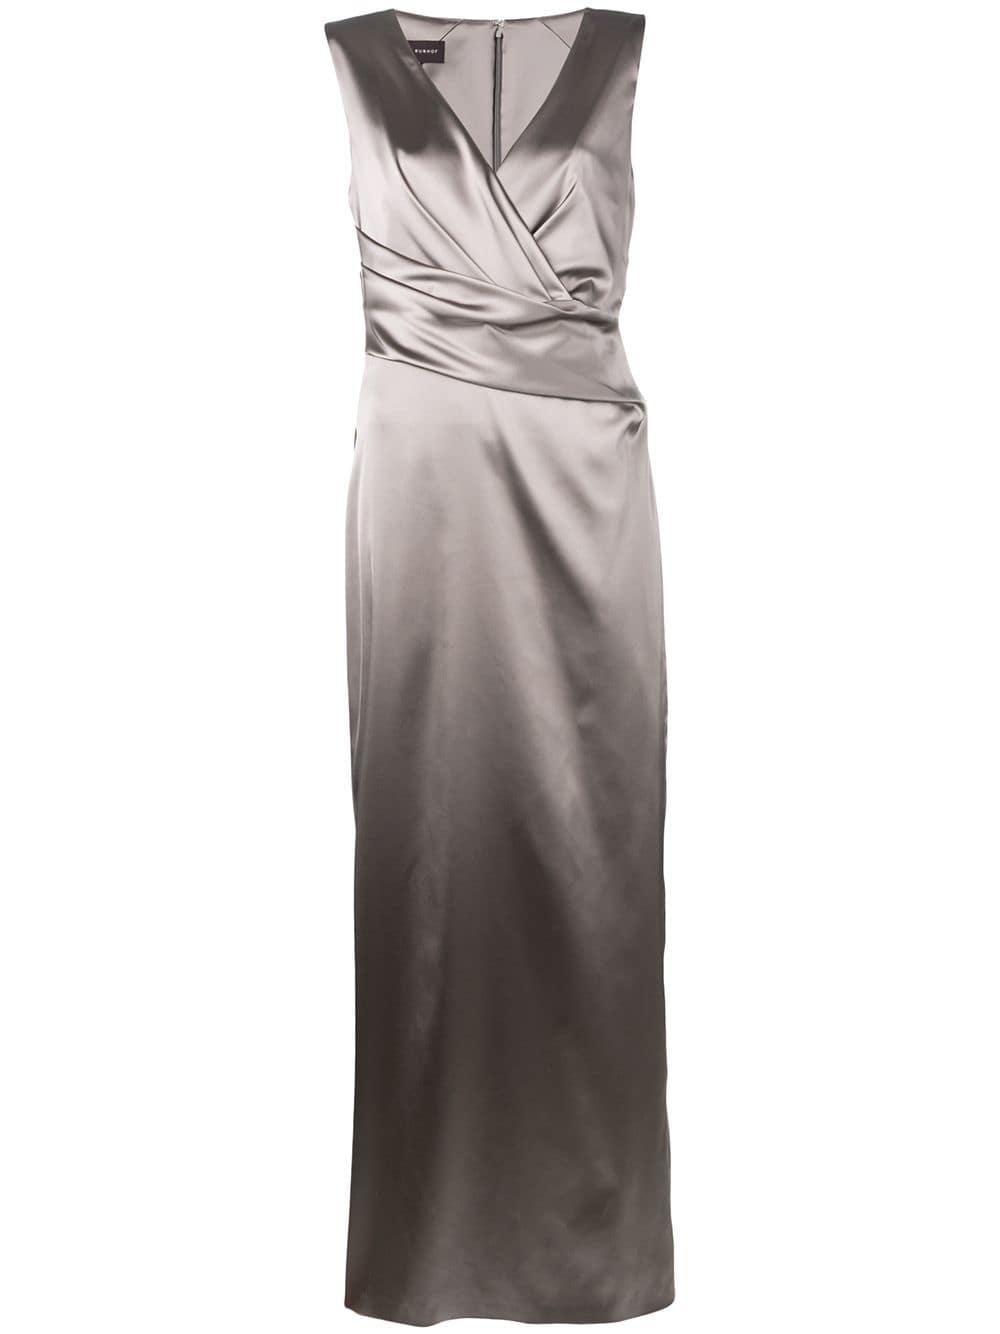 Grey fitted evening gown featuring a deep V neck TALBOT RUNHOF |  | RODIGO1-1200118